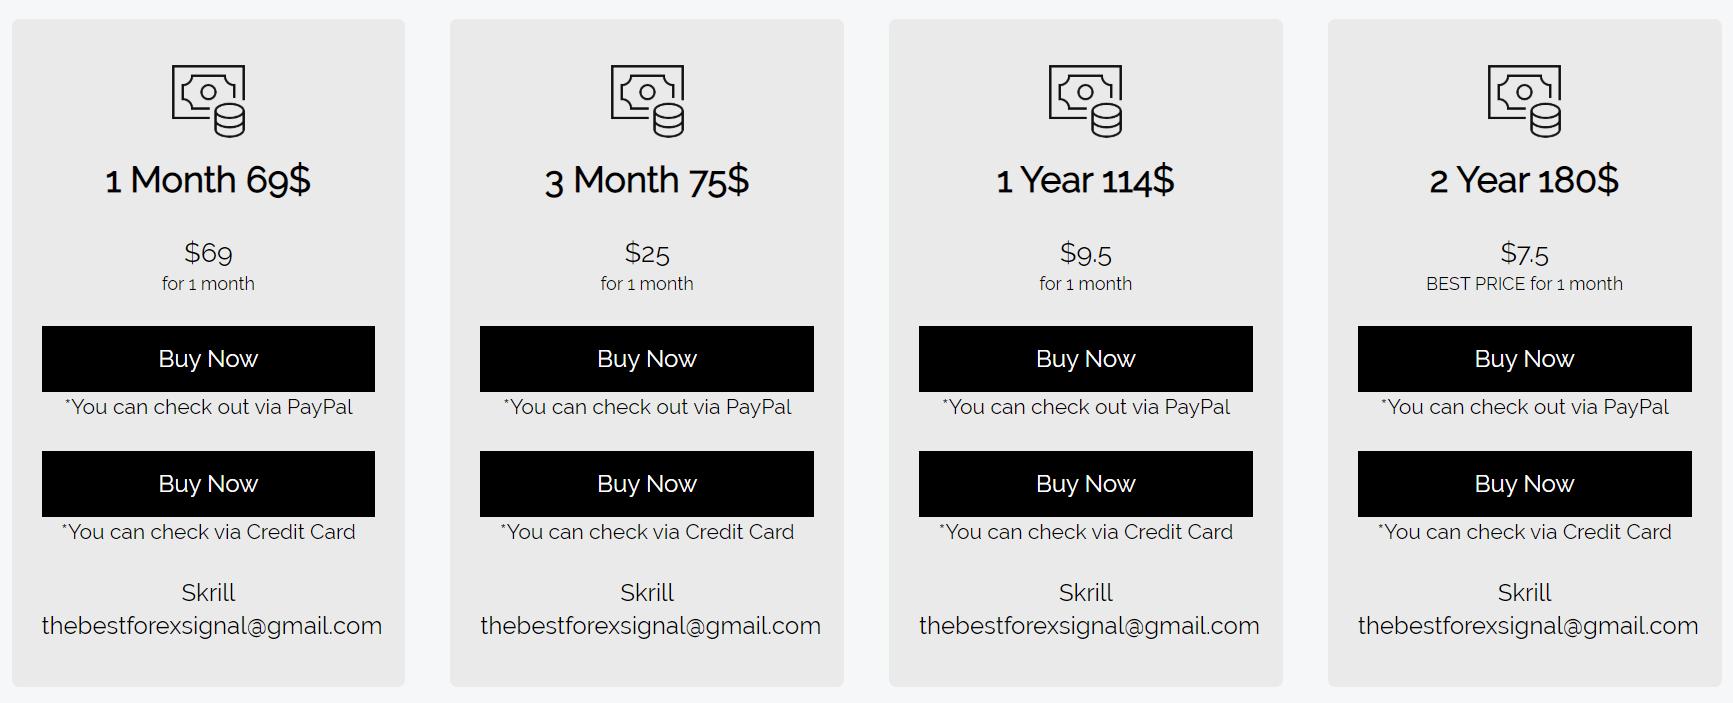 TheBestForexSignal Pricing